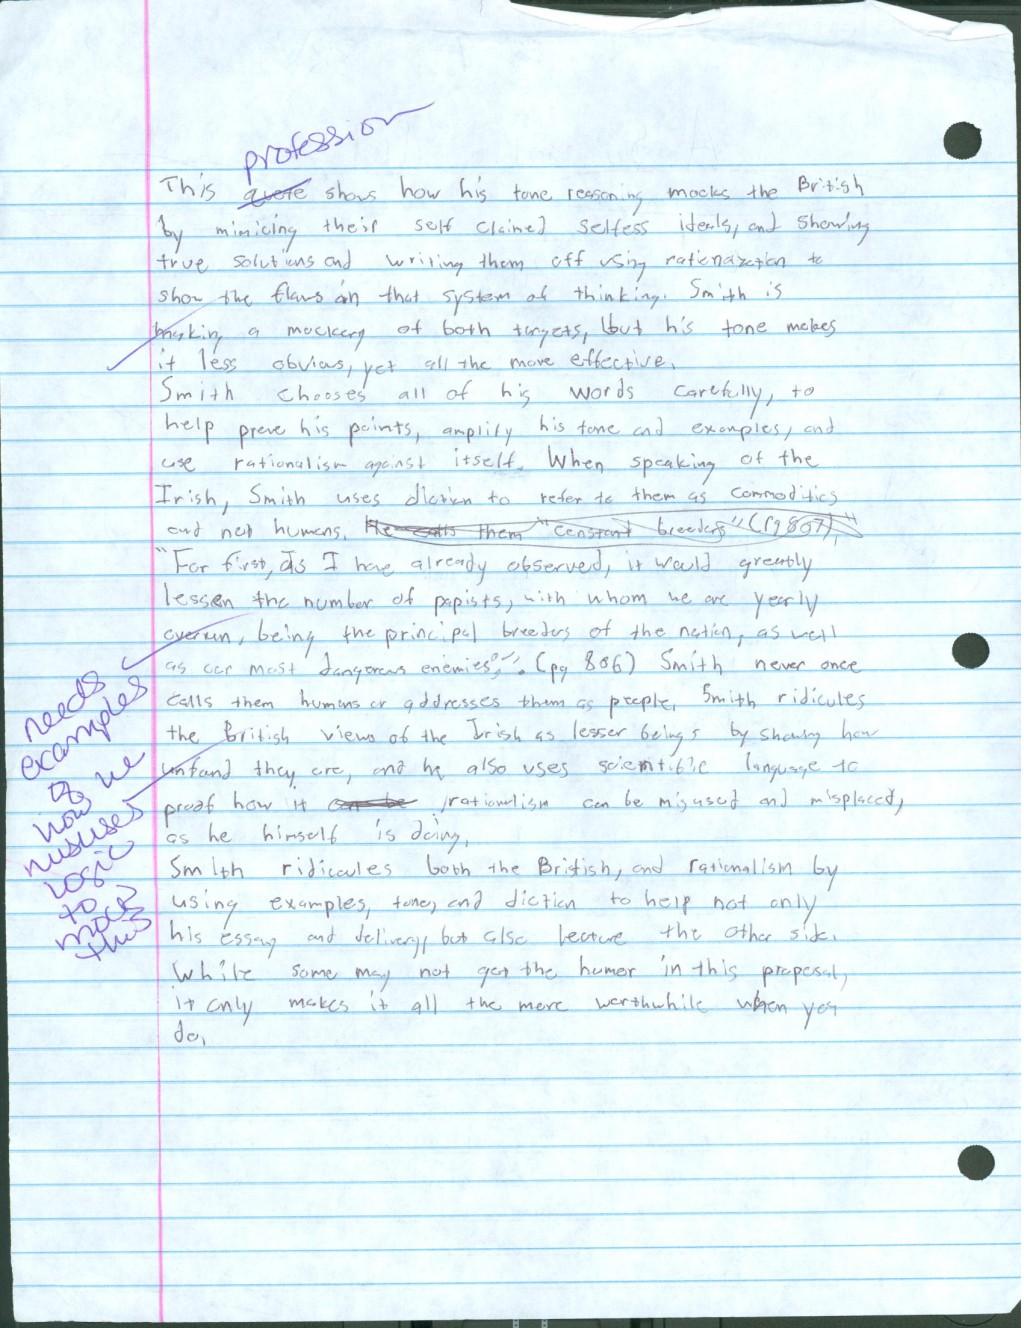 016 Satirical Essay Topics Example Essays Texting Bookman